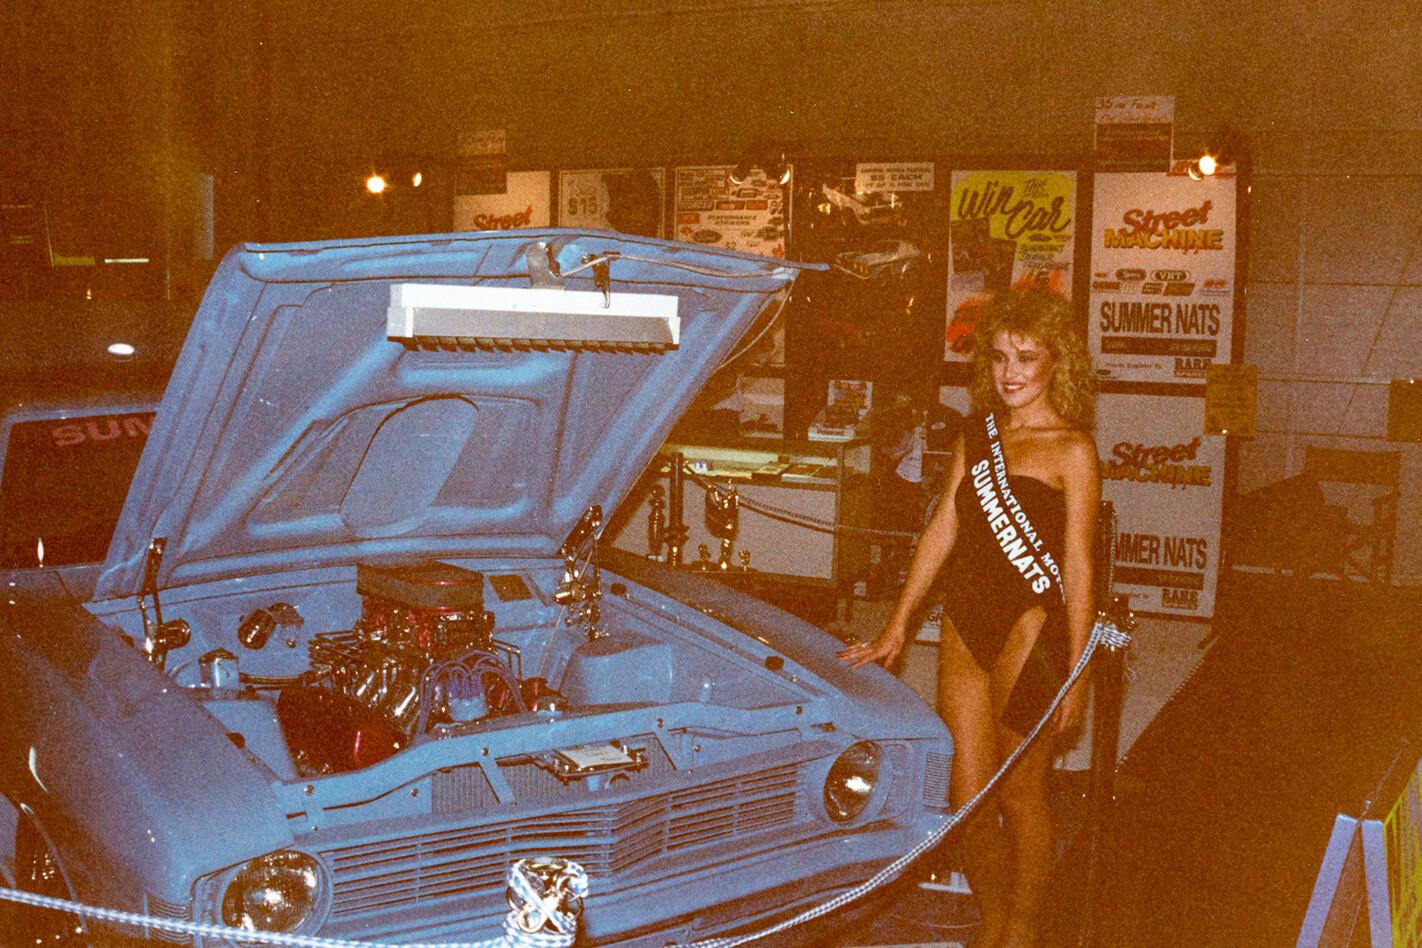 1990 Sydney International Motor Show